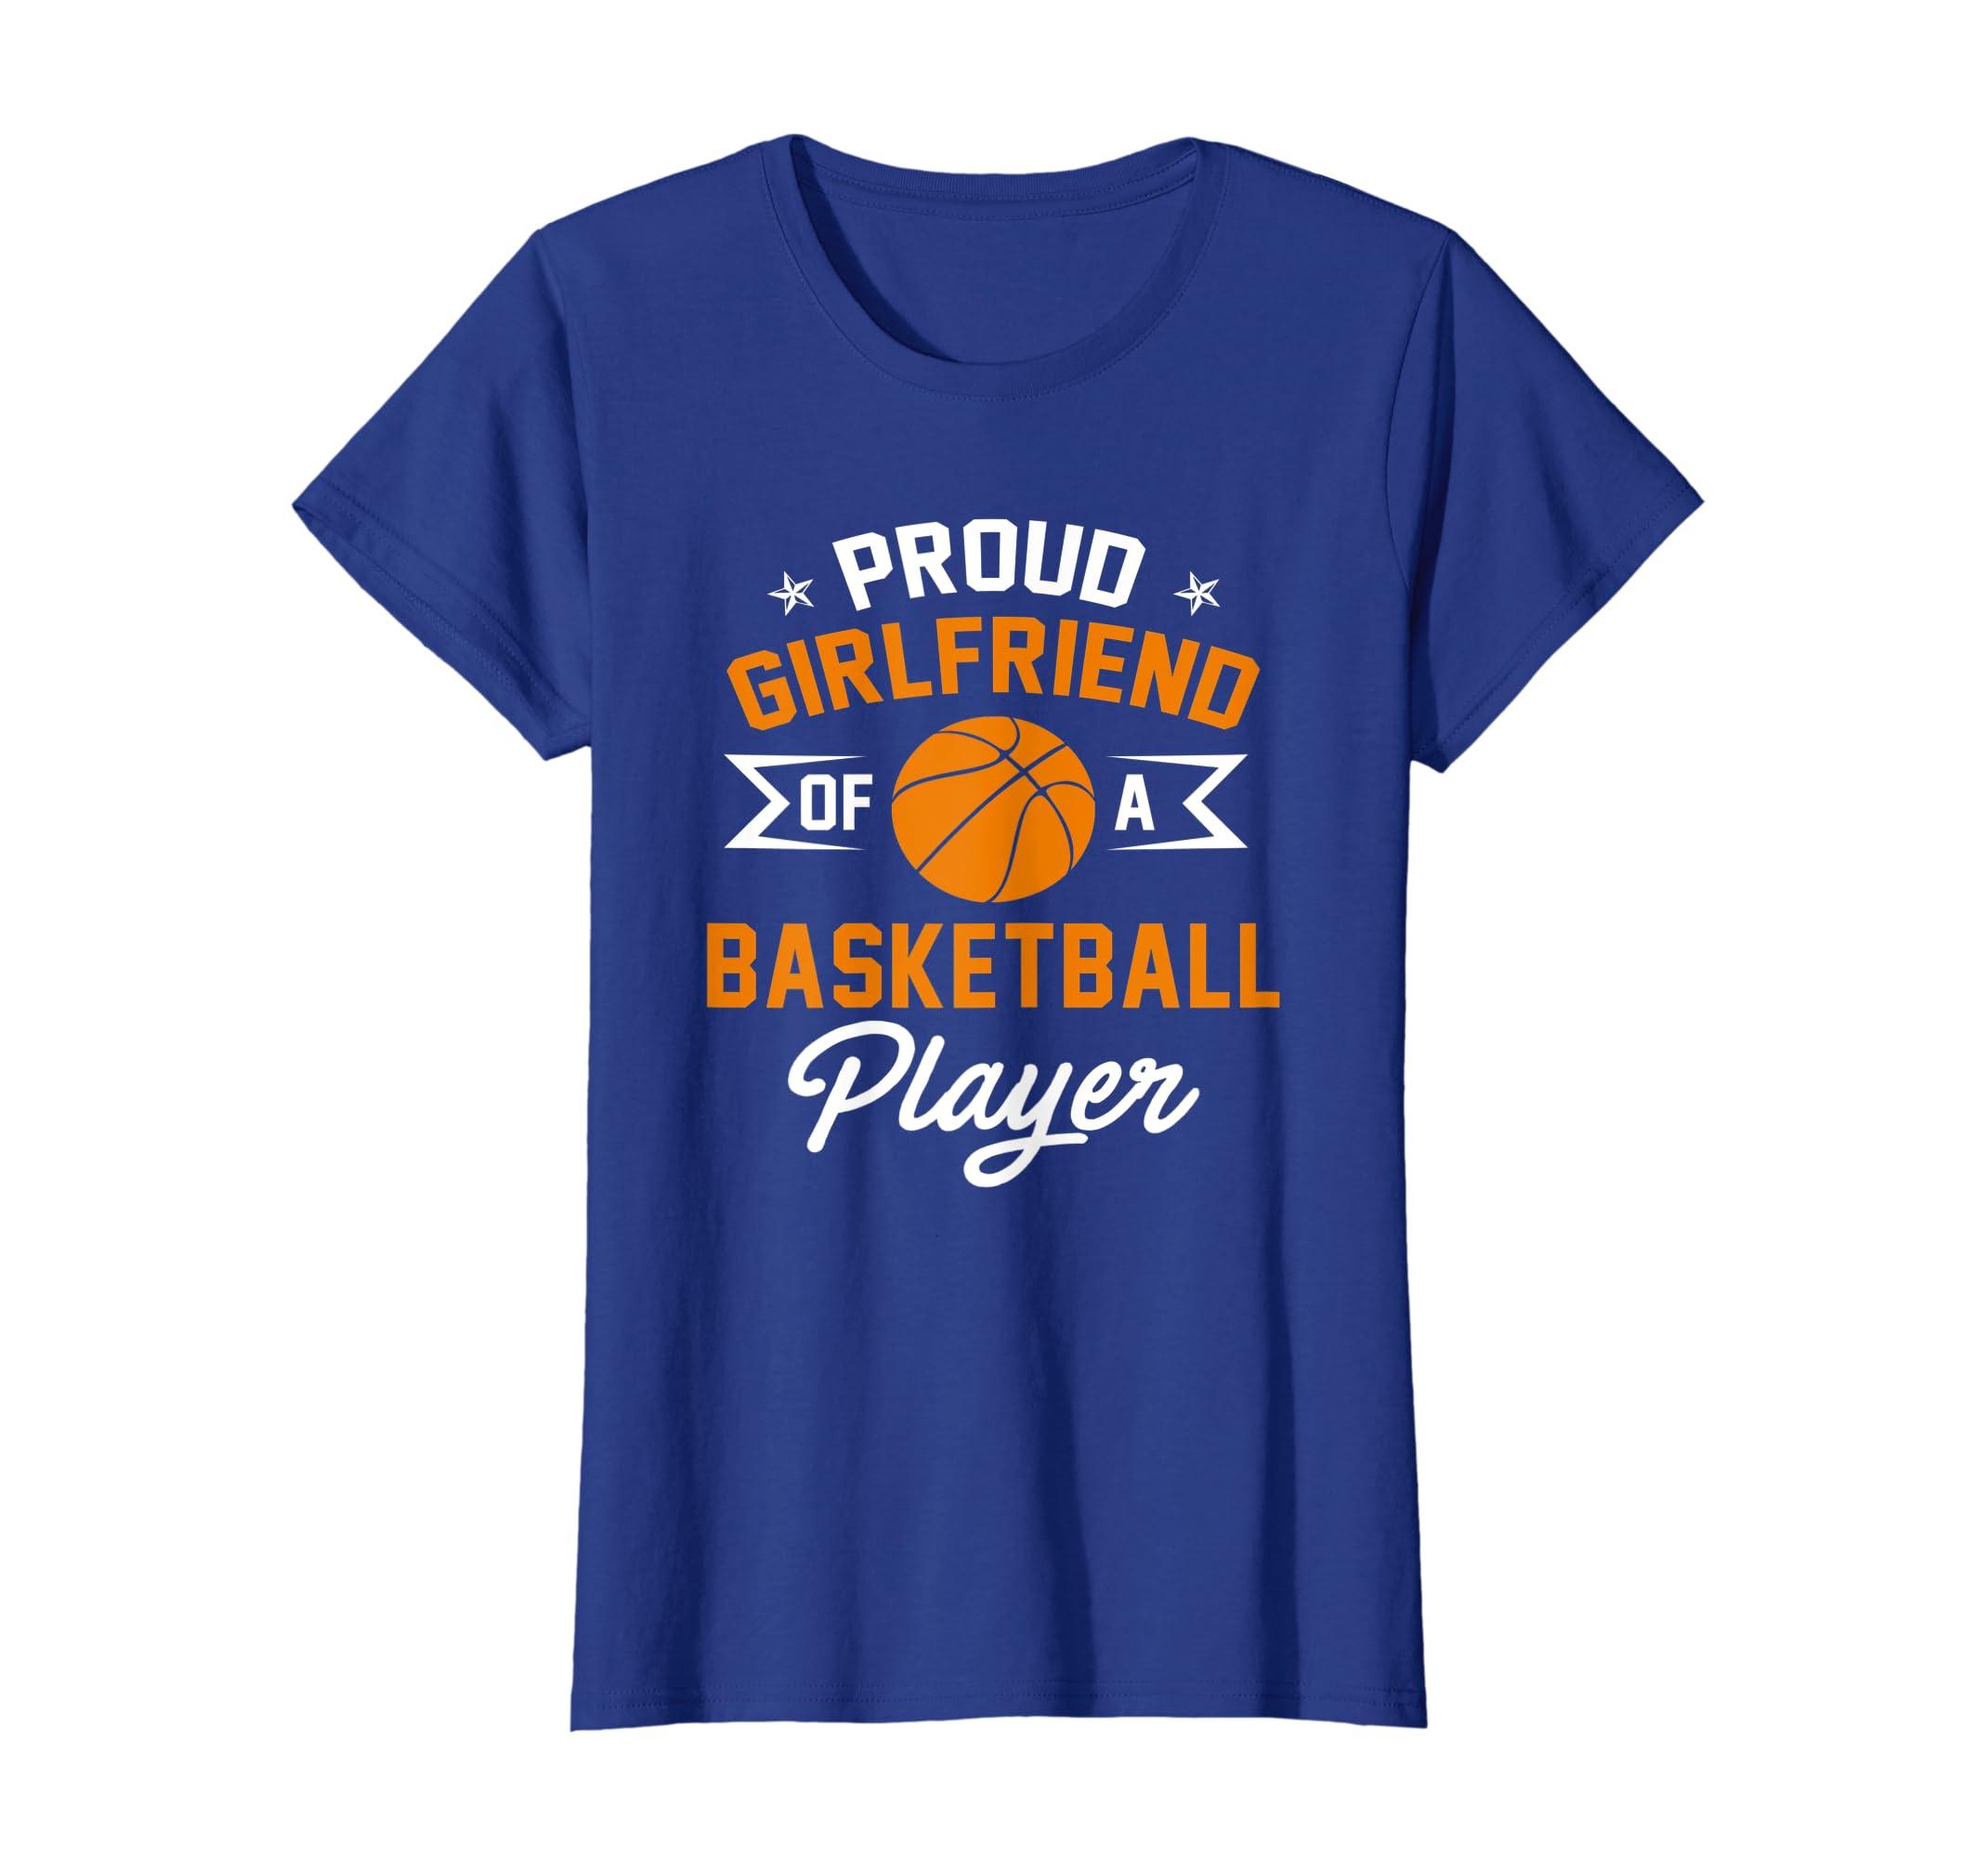 a3ec15ce4b1 Amazon.com  Proud Girlfriend Of A Basketball Player T-shirt  Clothing